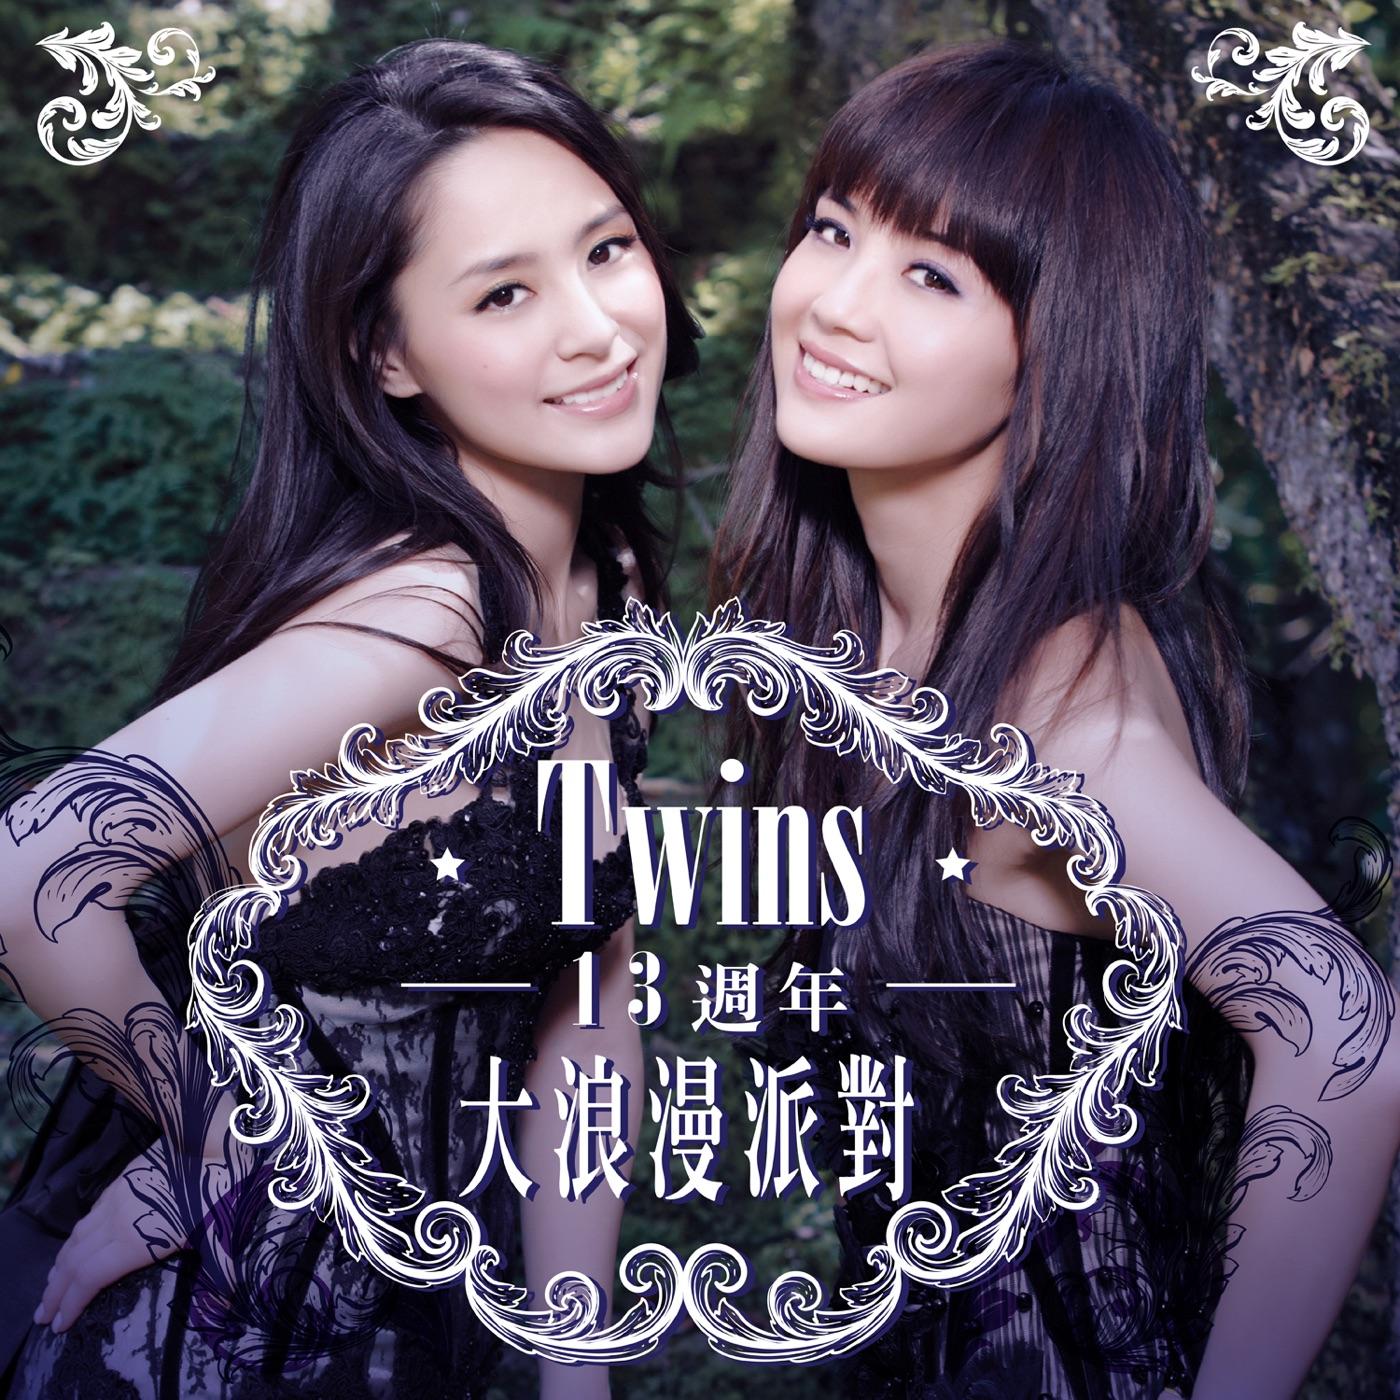 Twins - 13周年大浪漫派对